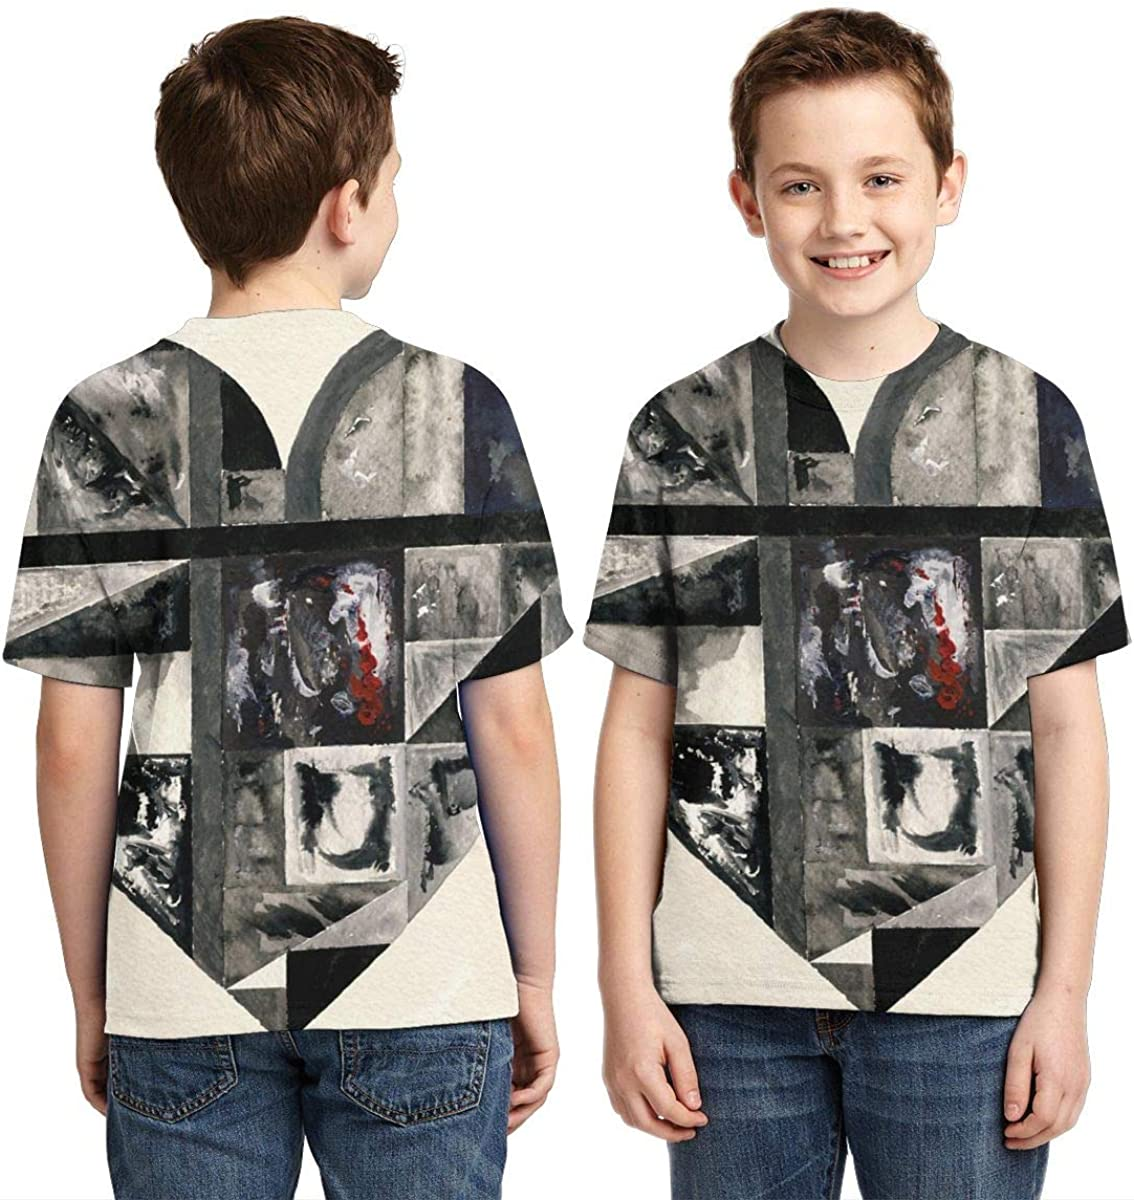 BowersJ Kids Gotye Kimbra Somebody That I Used to Know Design 3D Printed Short Sleeve Tees for Girls /& Boys Black